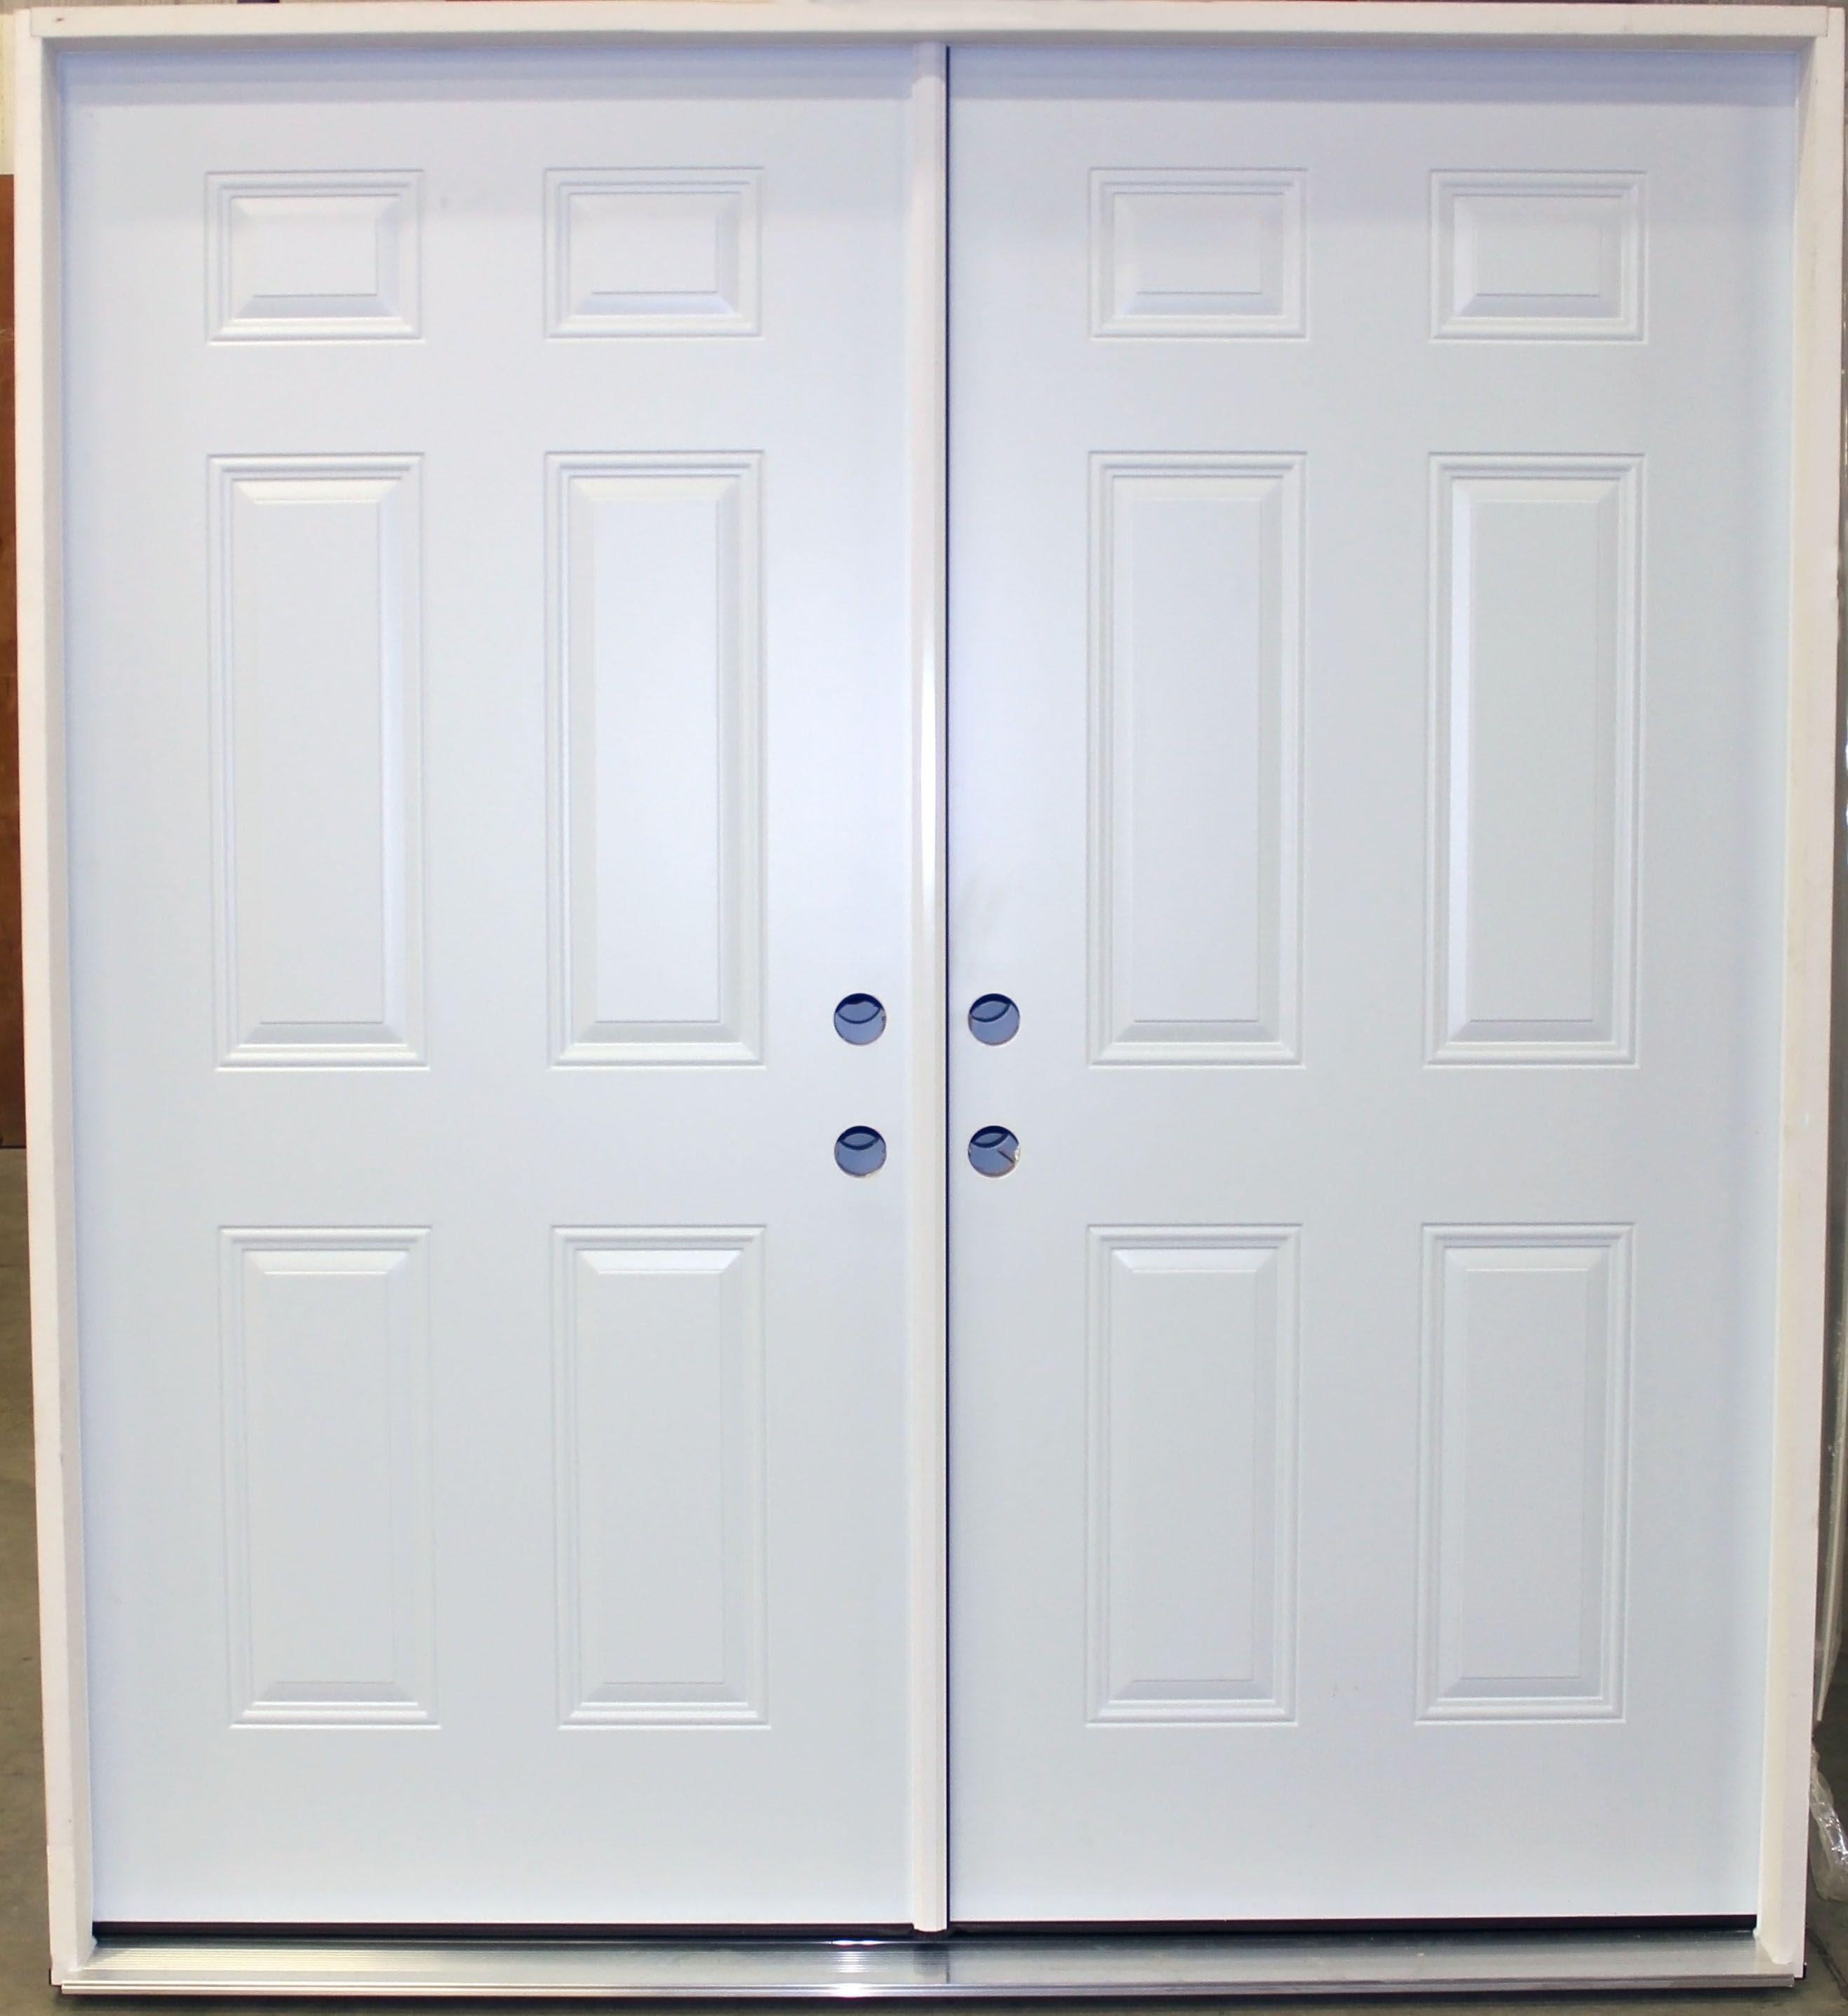 measurements exterior double splendid interior within modernist opening prehung photography see rough door doors